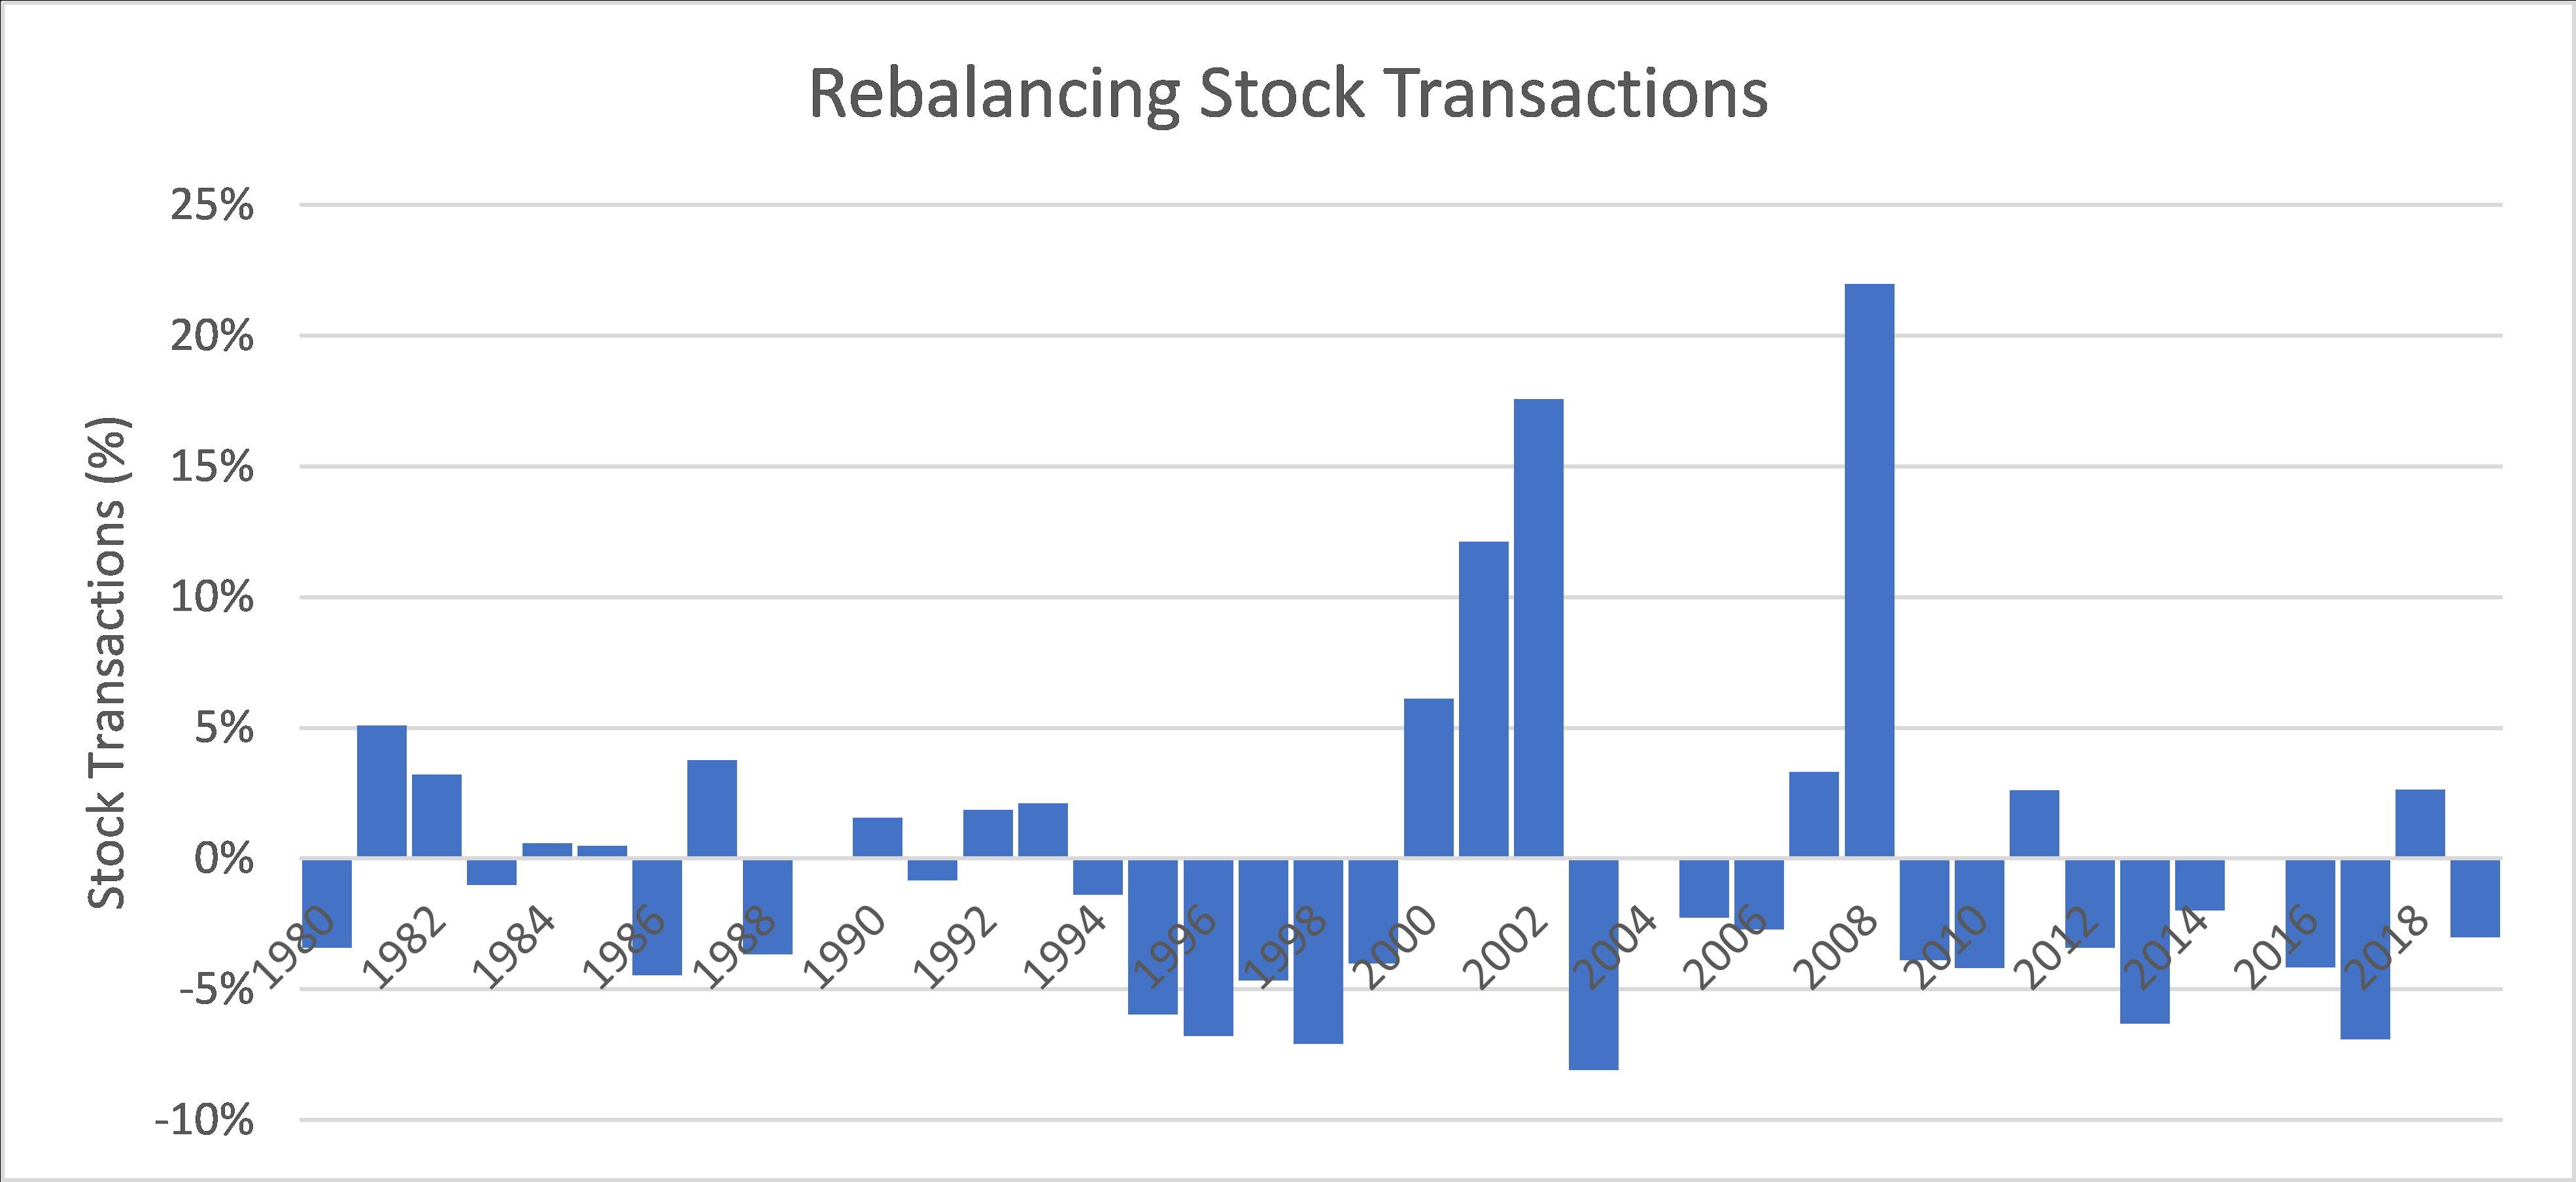 Rebalancing Stock Transactions